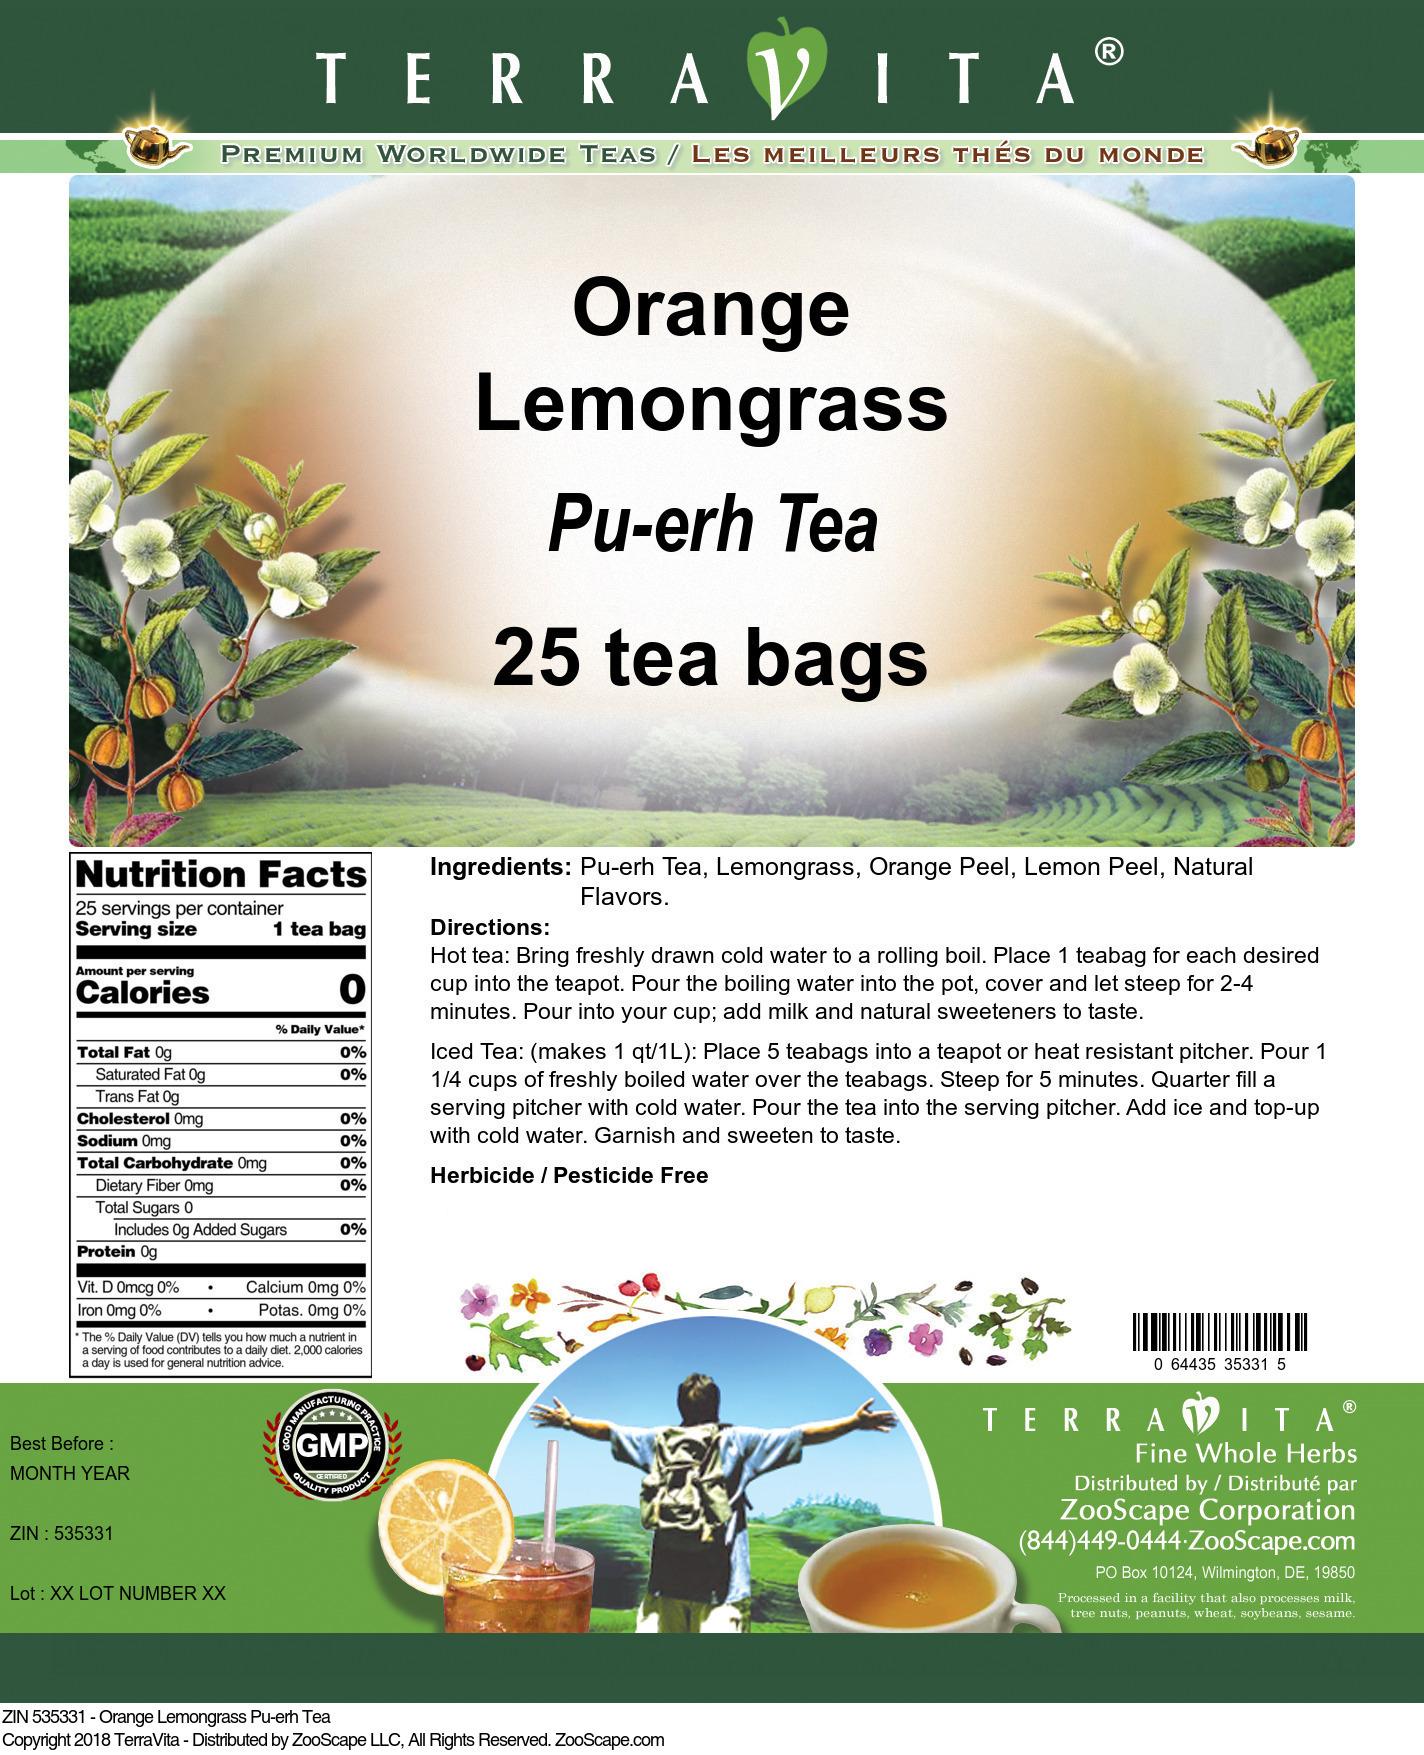 Orange Lemongrass Pu-erh Tea